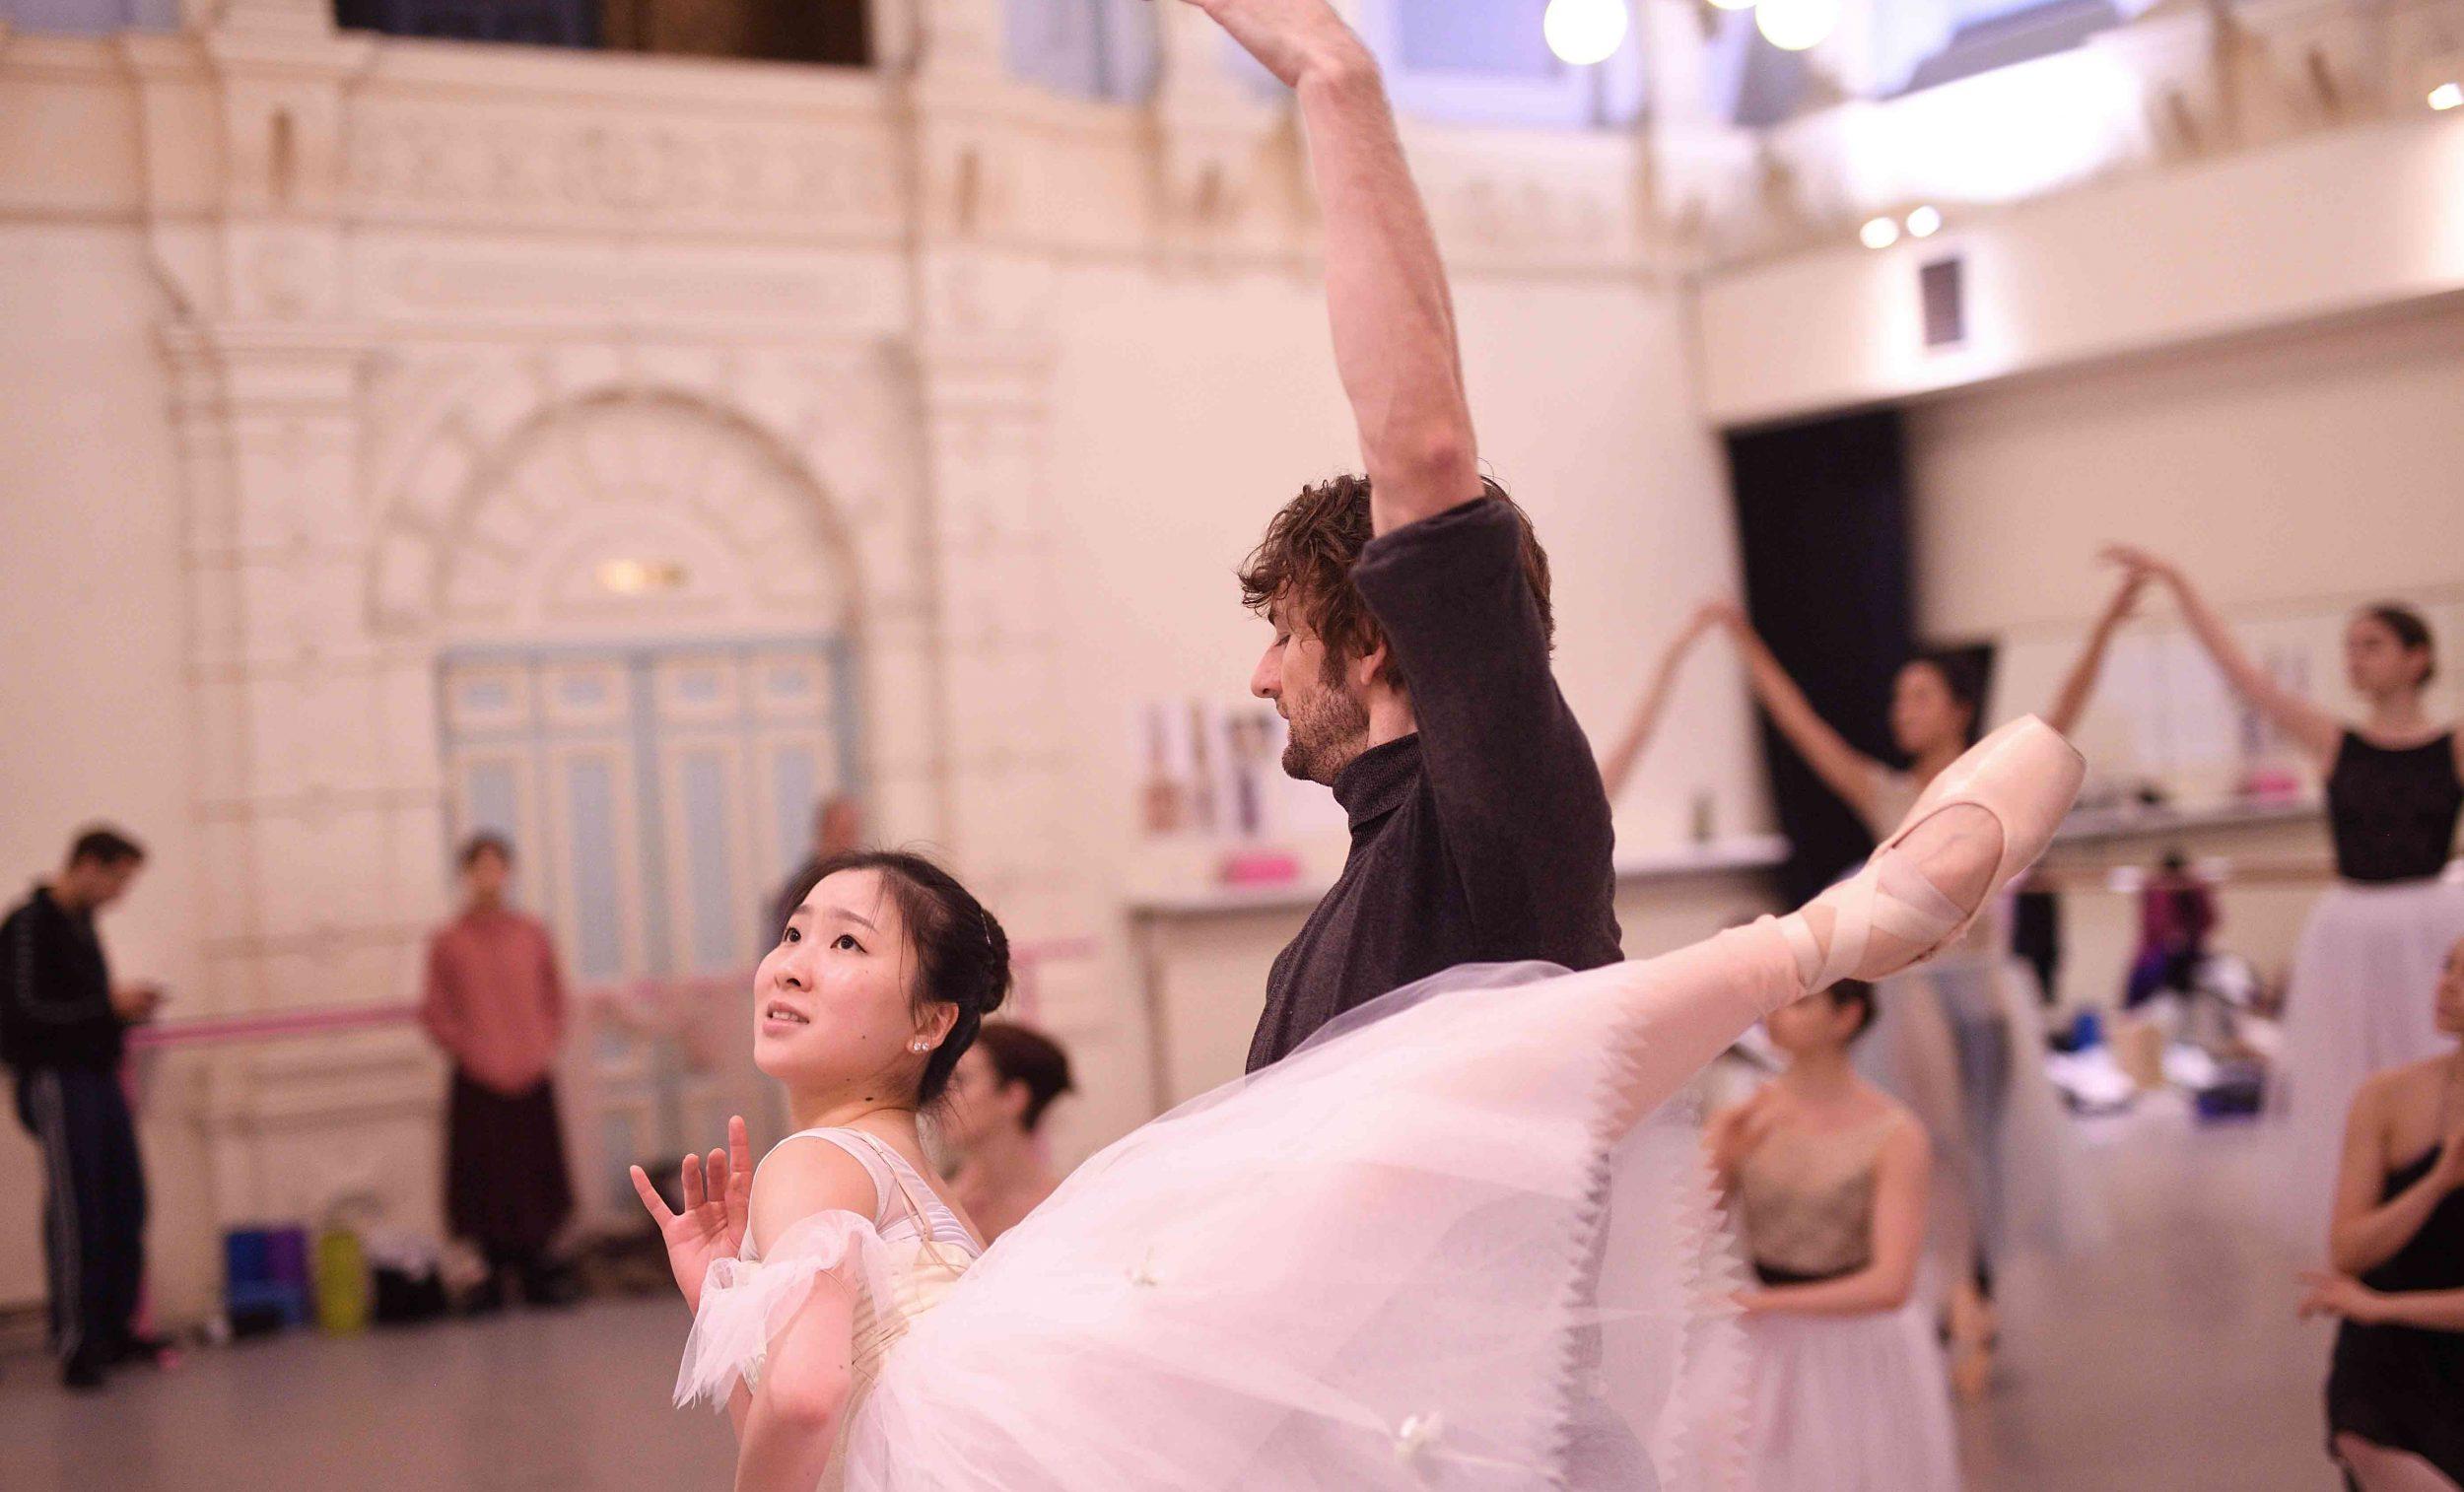 Rina-Kanehara-and-Aaron-Robison-rehearsing-La-Sylphide-©-Laurent-Liotardo